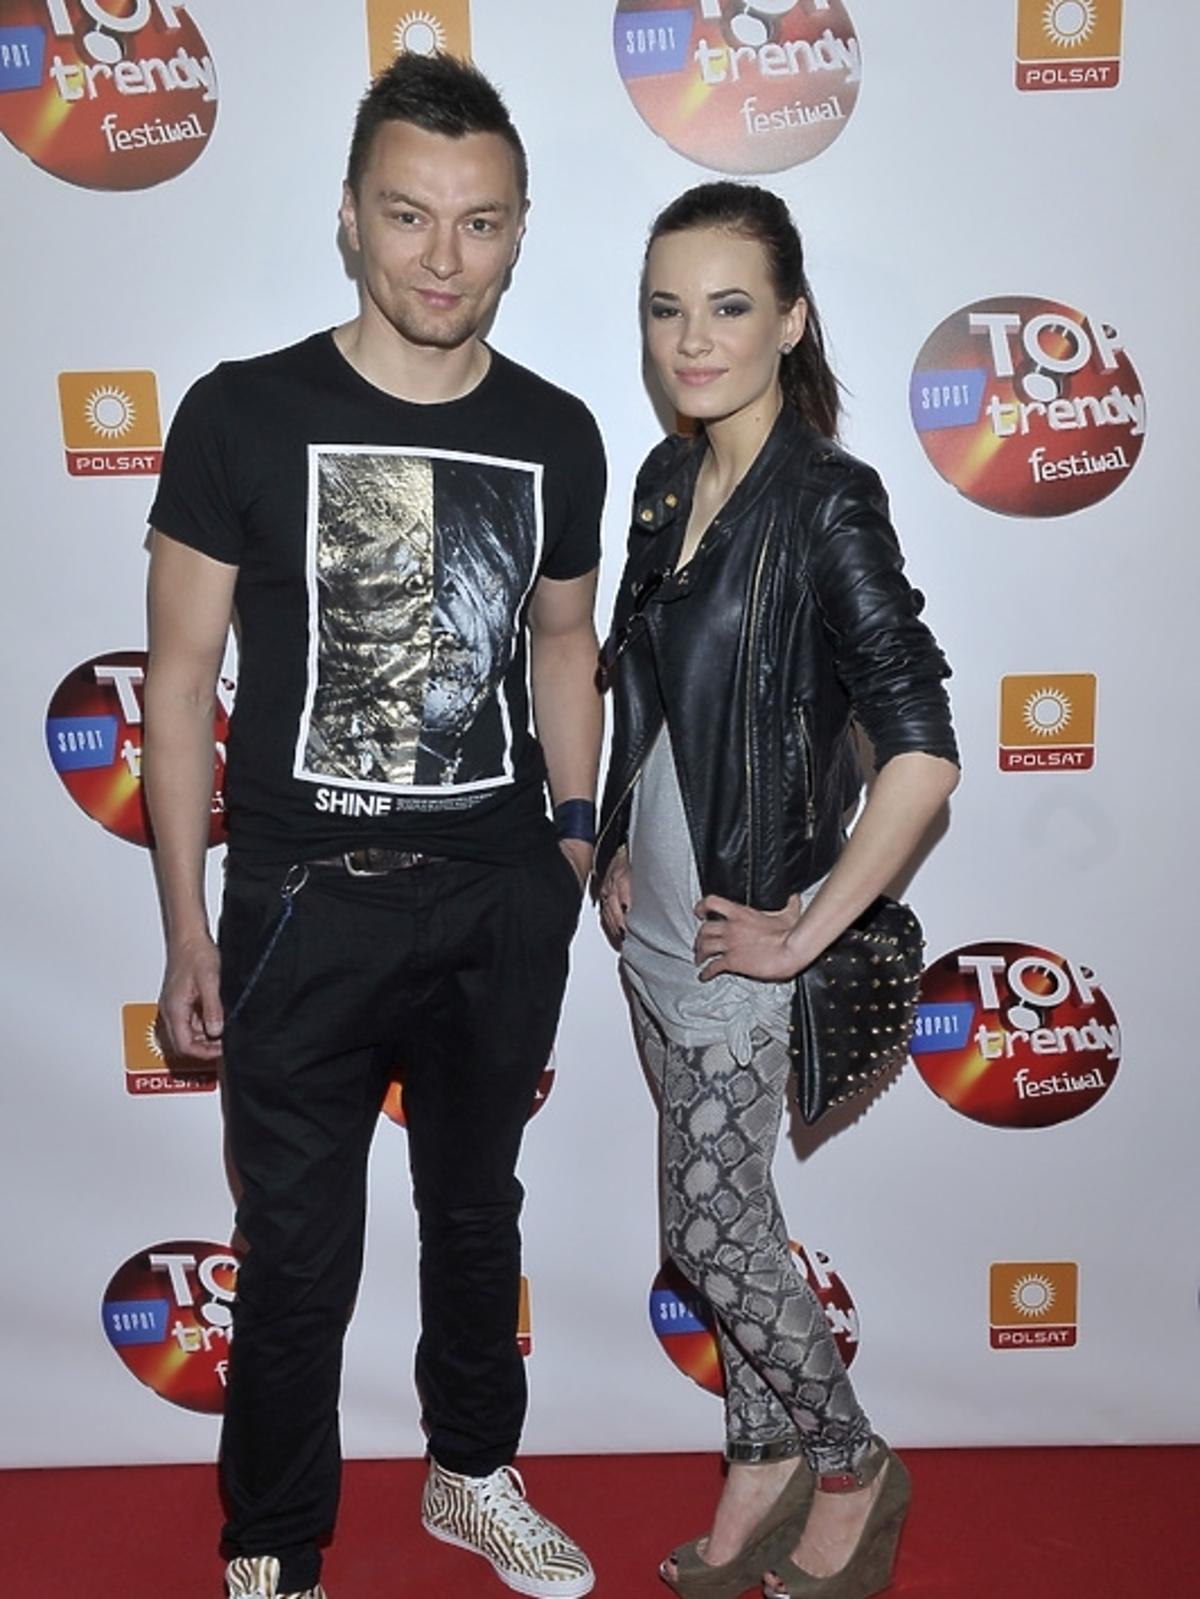 Liber i Natalia Szroeder na konferencji Top Trendy 2013